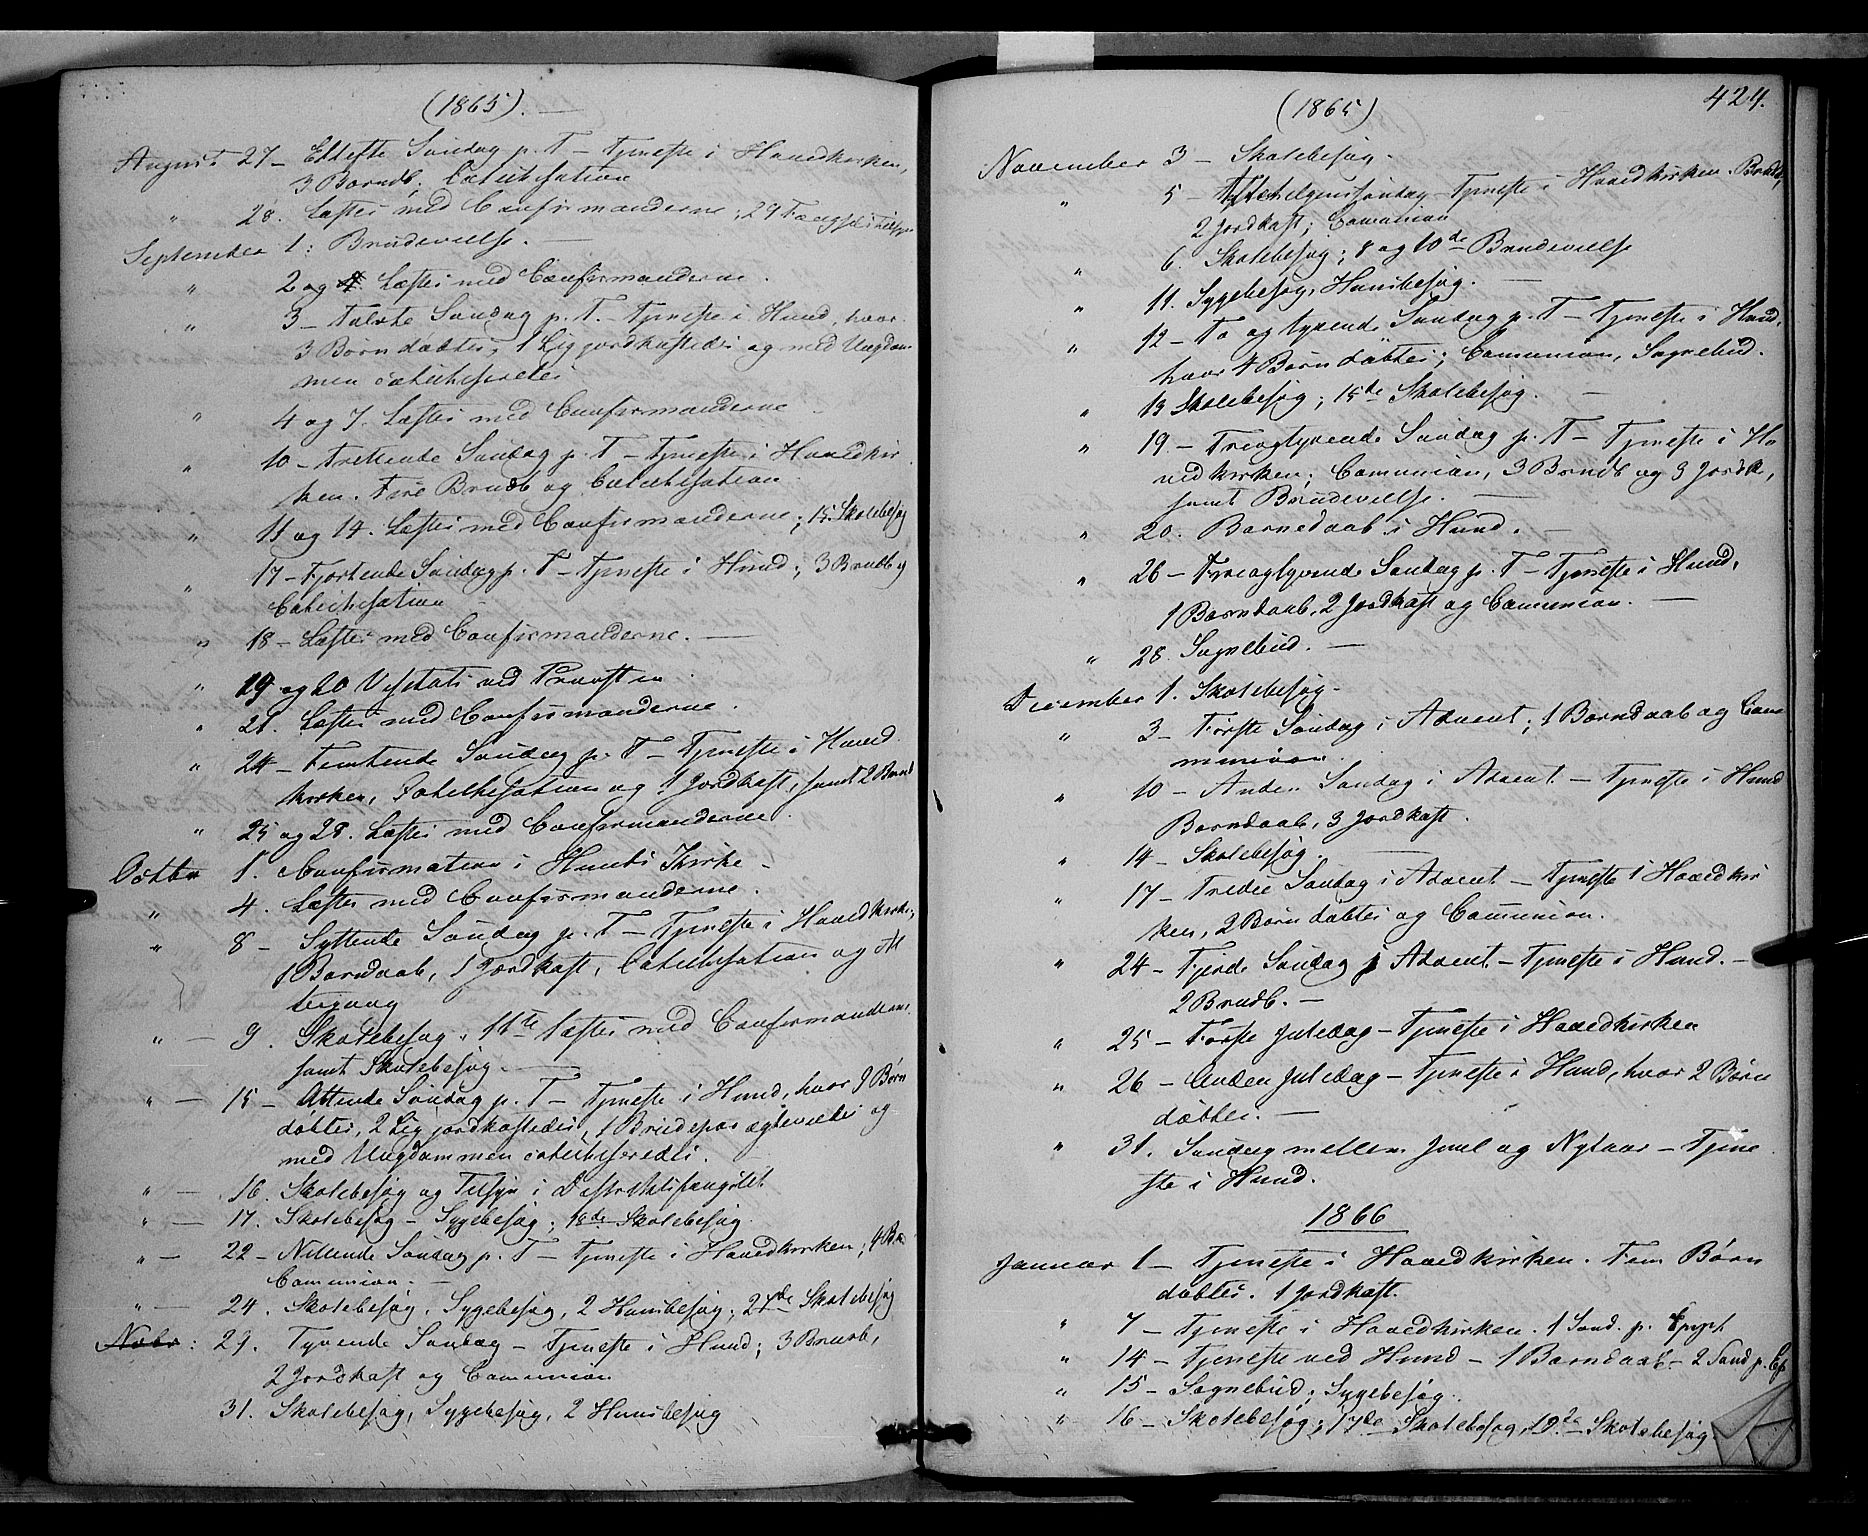 SAH, Vardal prestekontor, H/Ha/Haa/L0006: Ministerialbok nr. 6, 1854-1866, s. 424